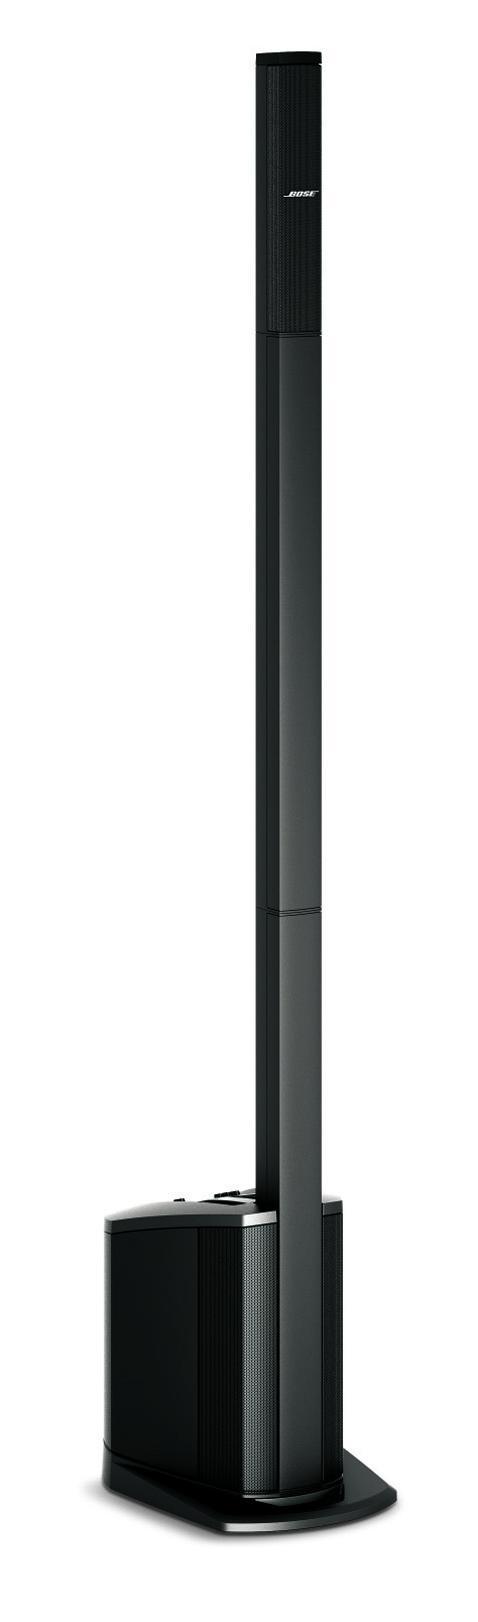 Paendstufen - Bose L1 Compact Portable Line Array Retoure (Zustand sehr gut) - Onlineshop Musikhaus Kirstein